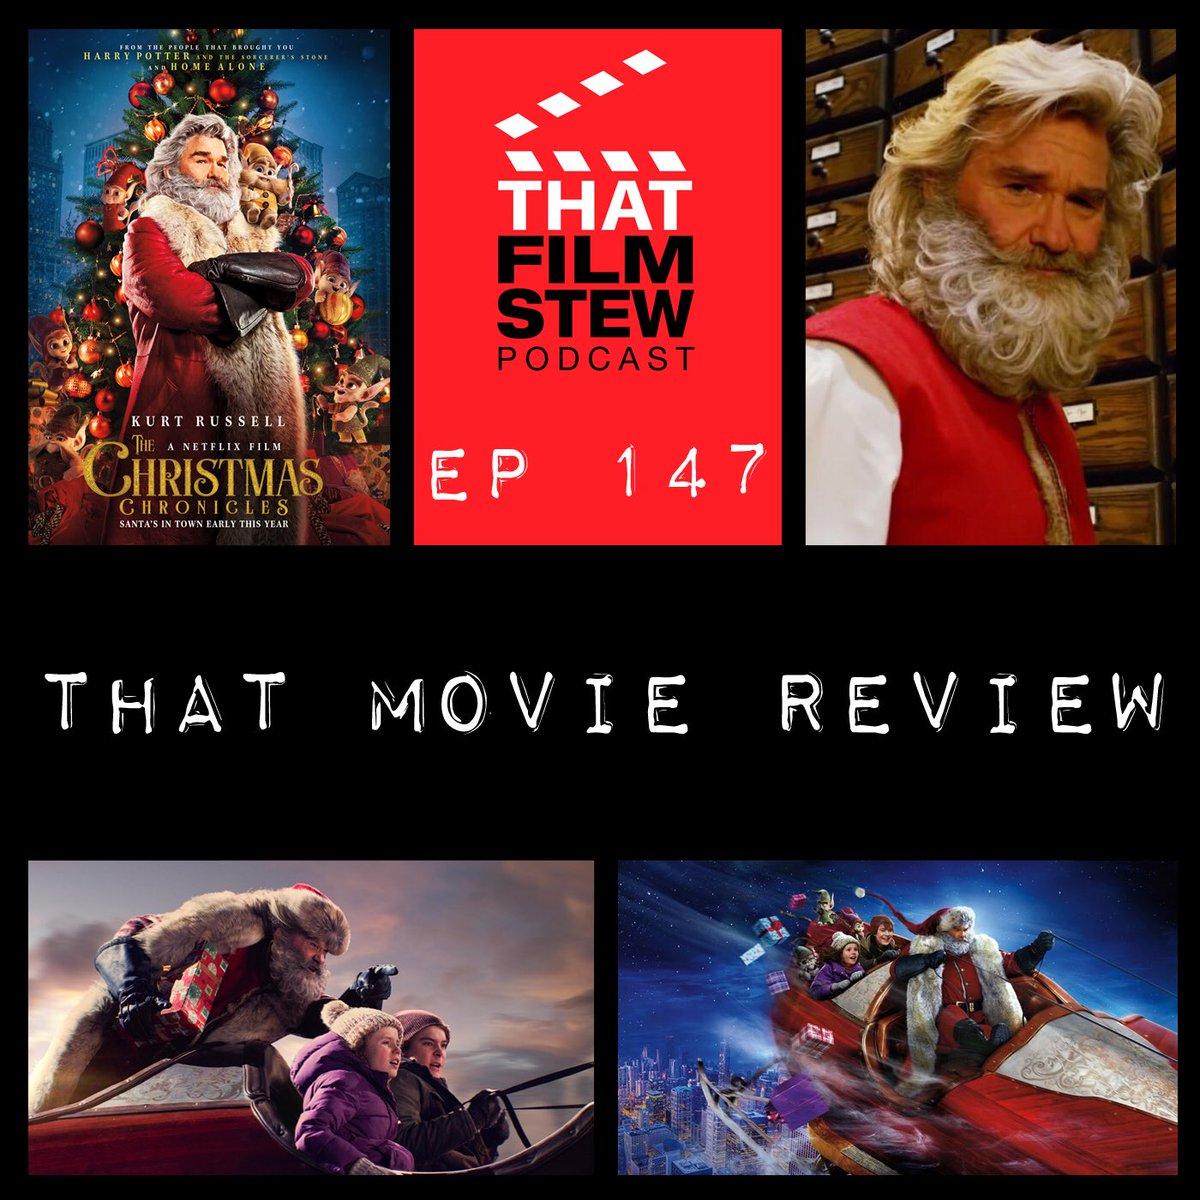 Christmas Chronicles Review.Thatfilmstewpodcast On Twitter New Episode Listen